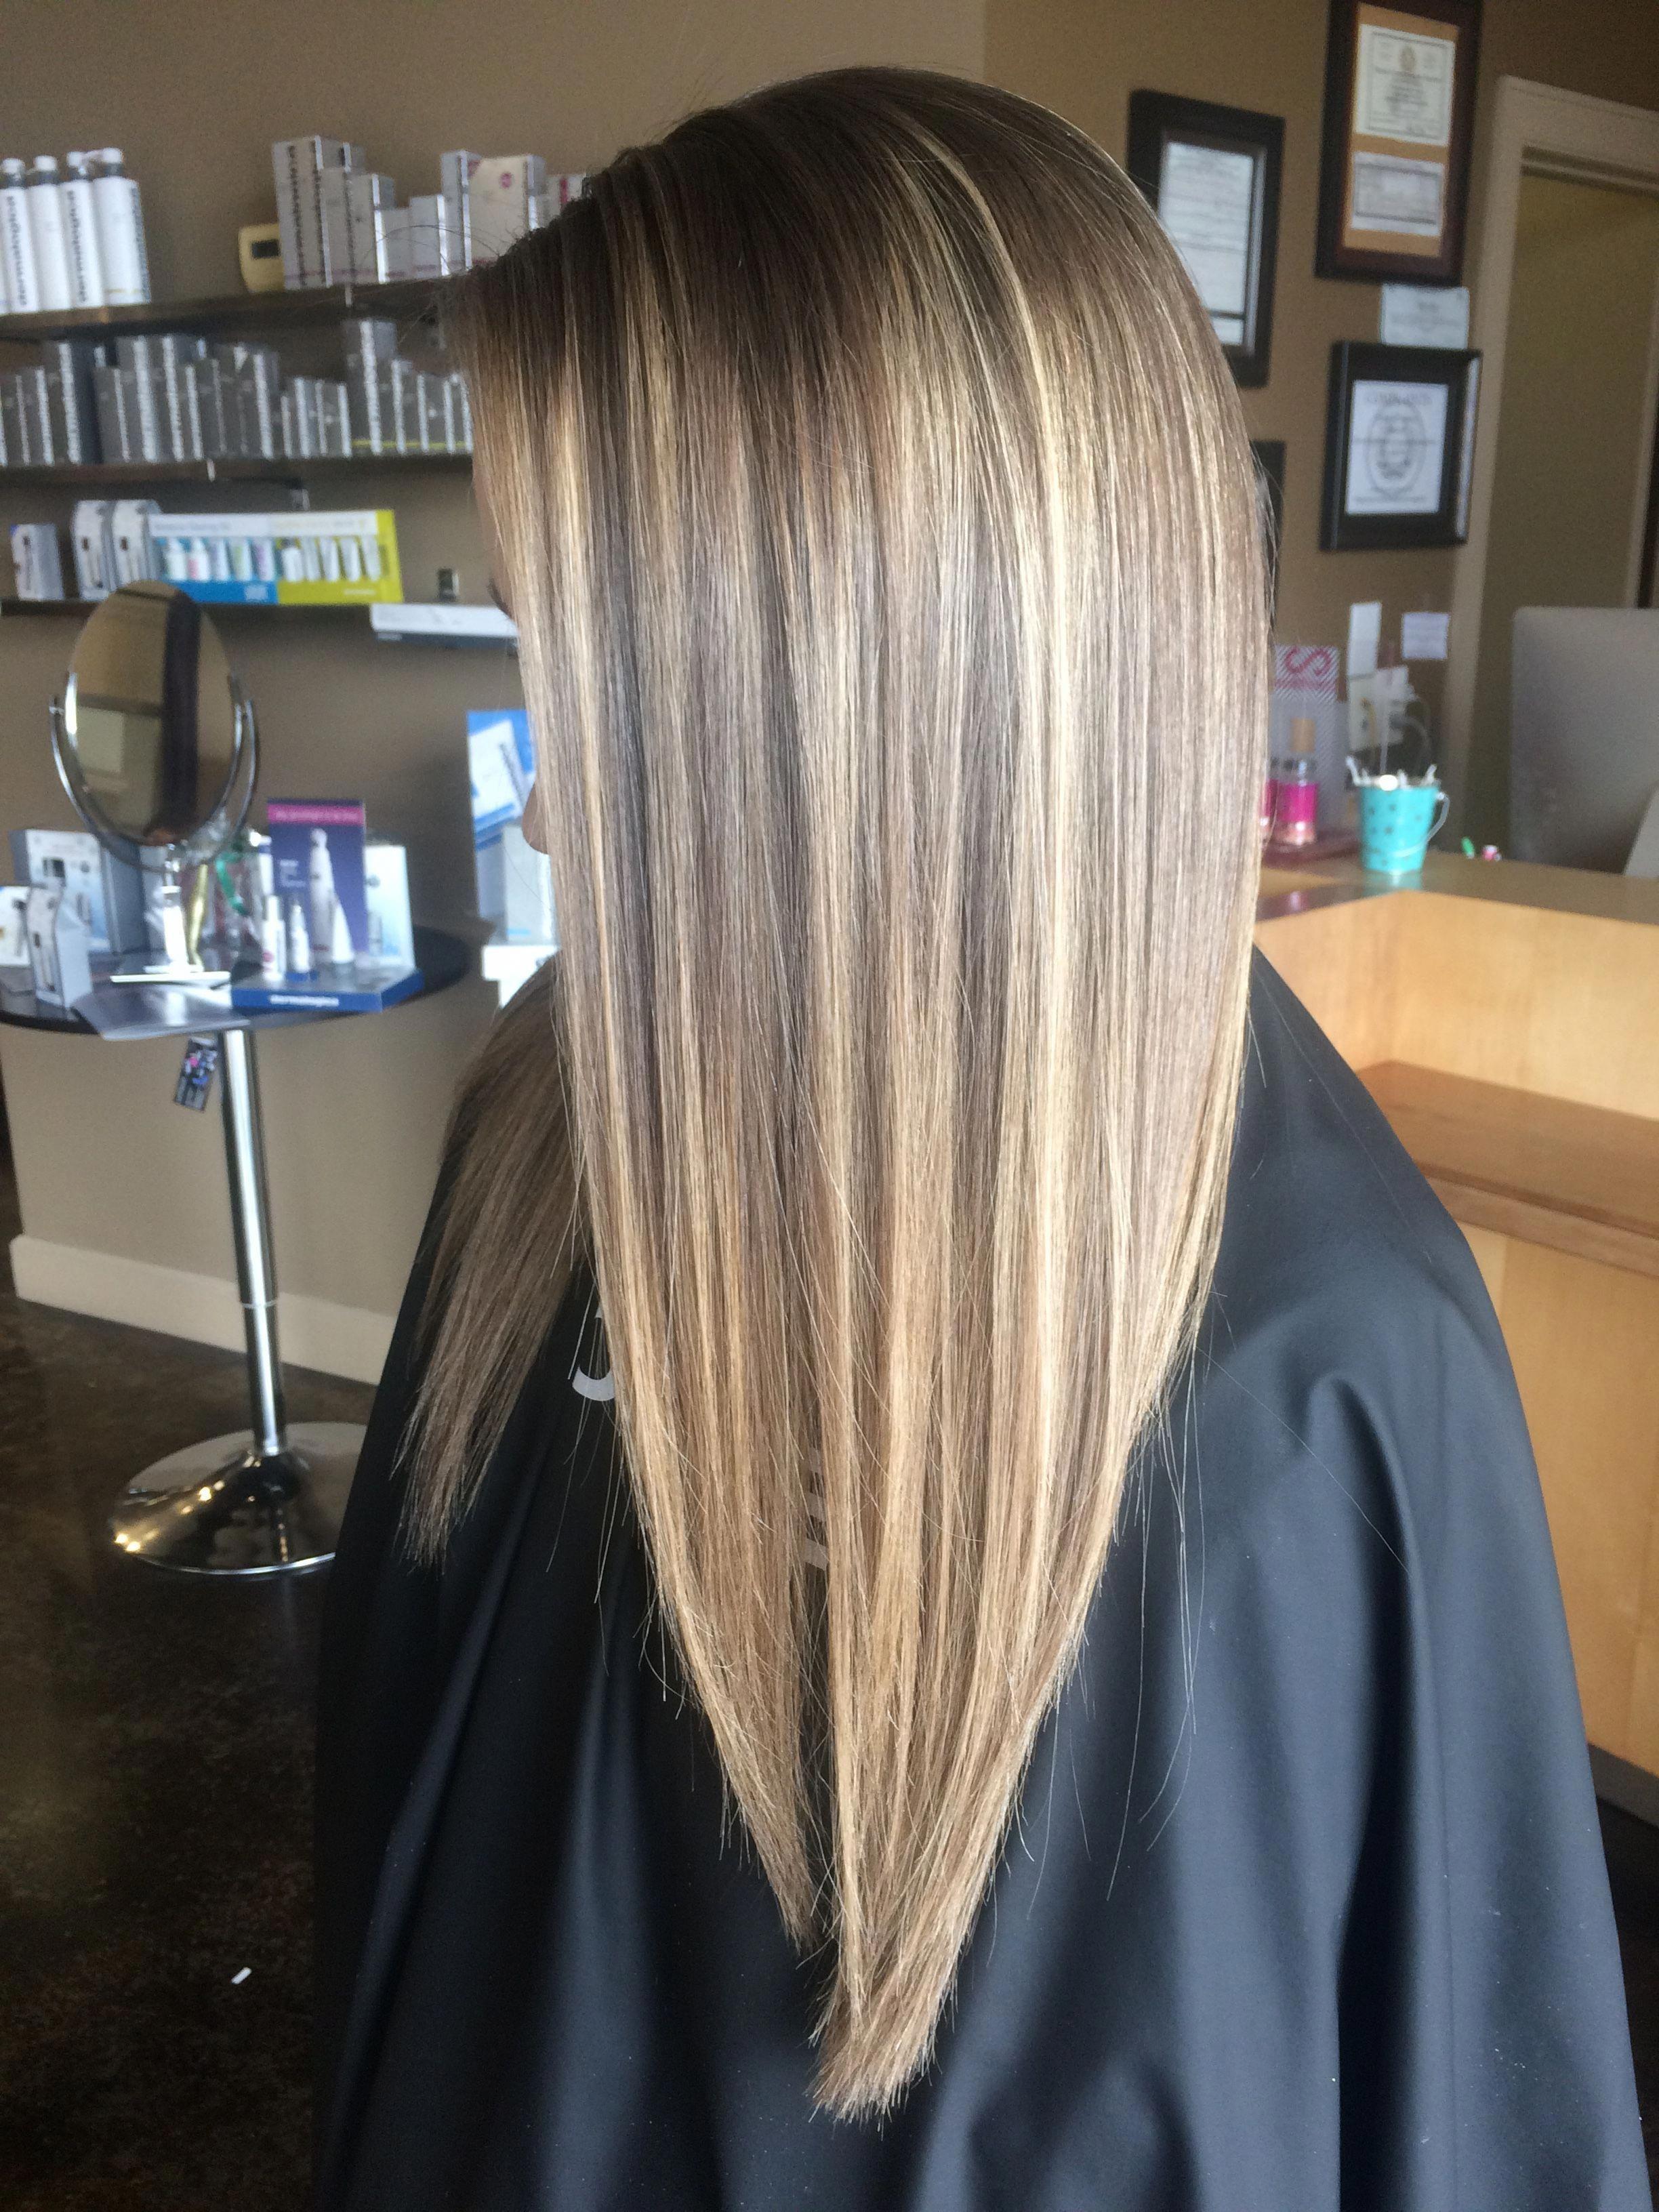 Natural Highlights Long Hair Straight Hair Nodamagewanted Long Hair Styles Straight Hairstyles Balayage Straight Hair